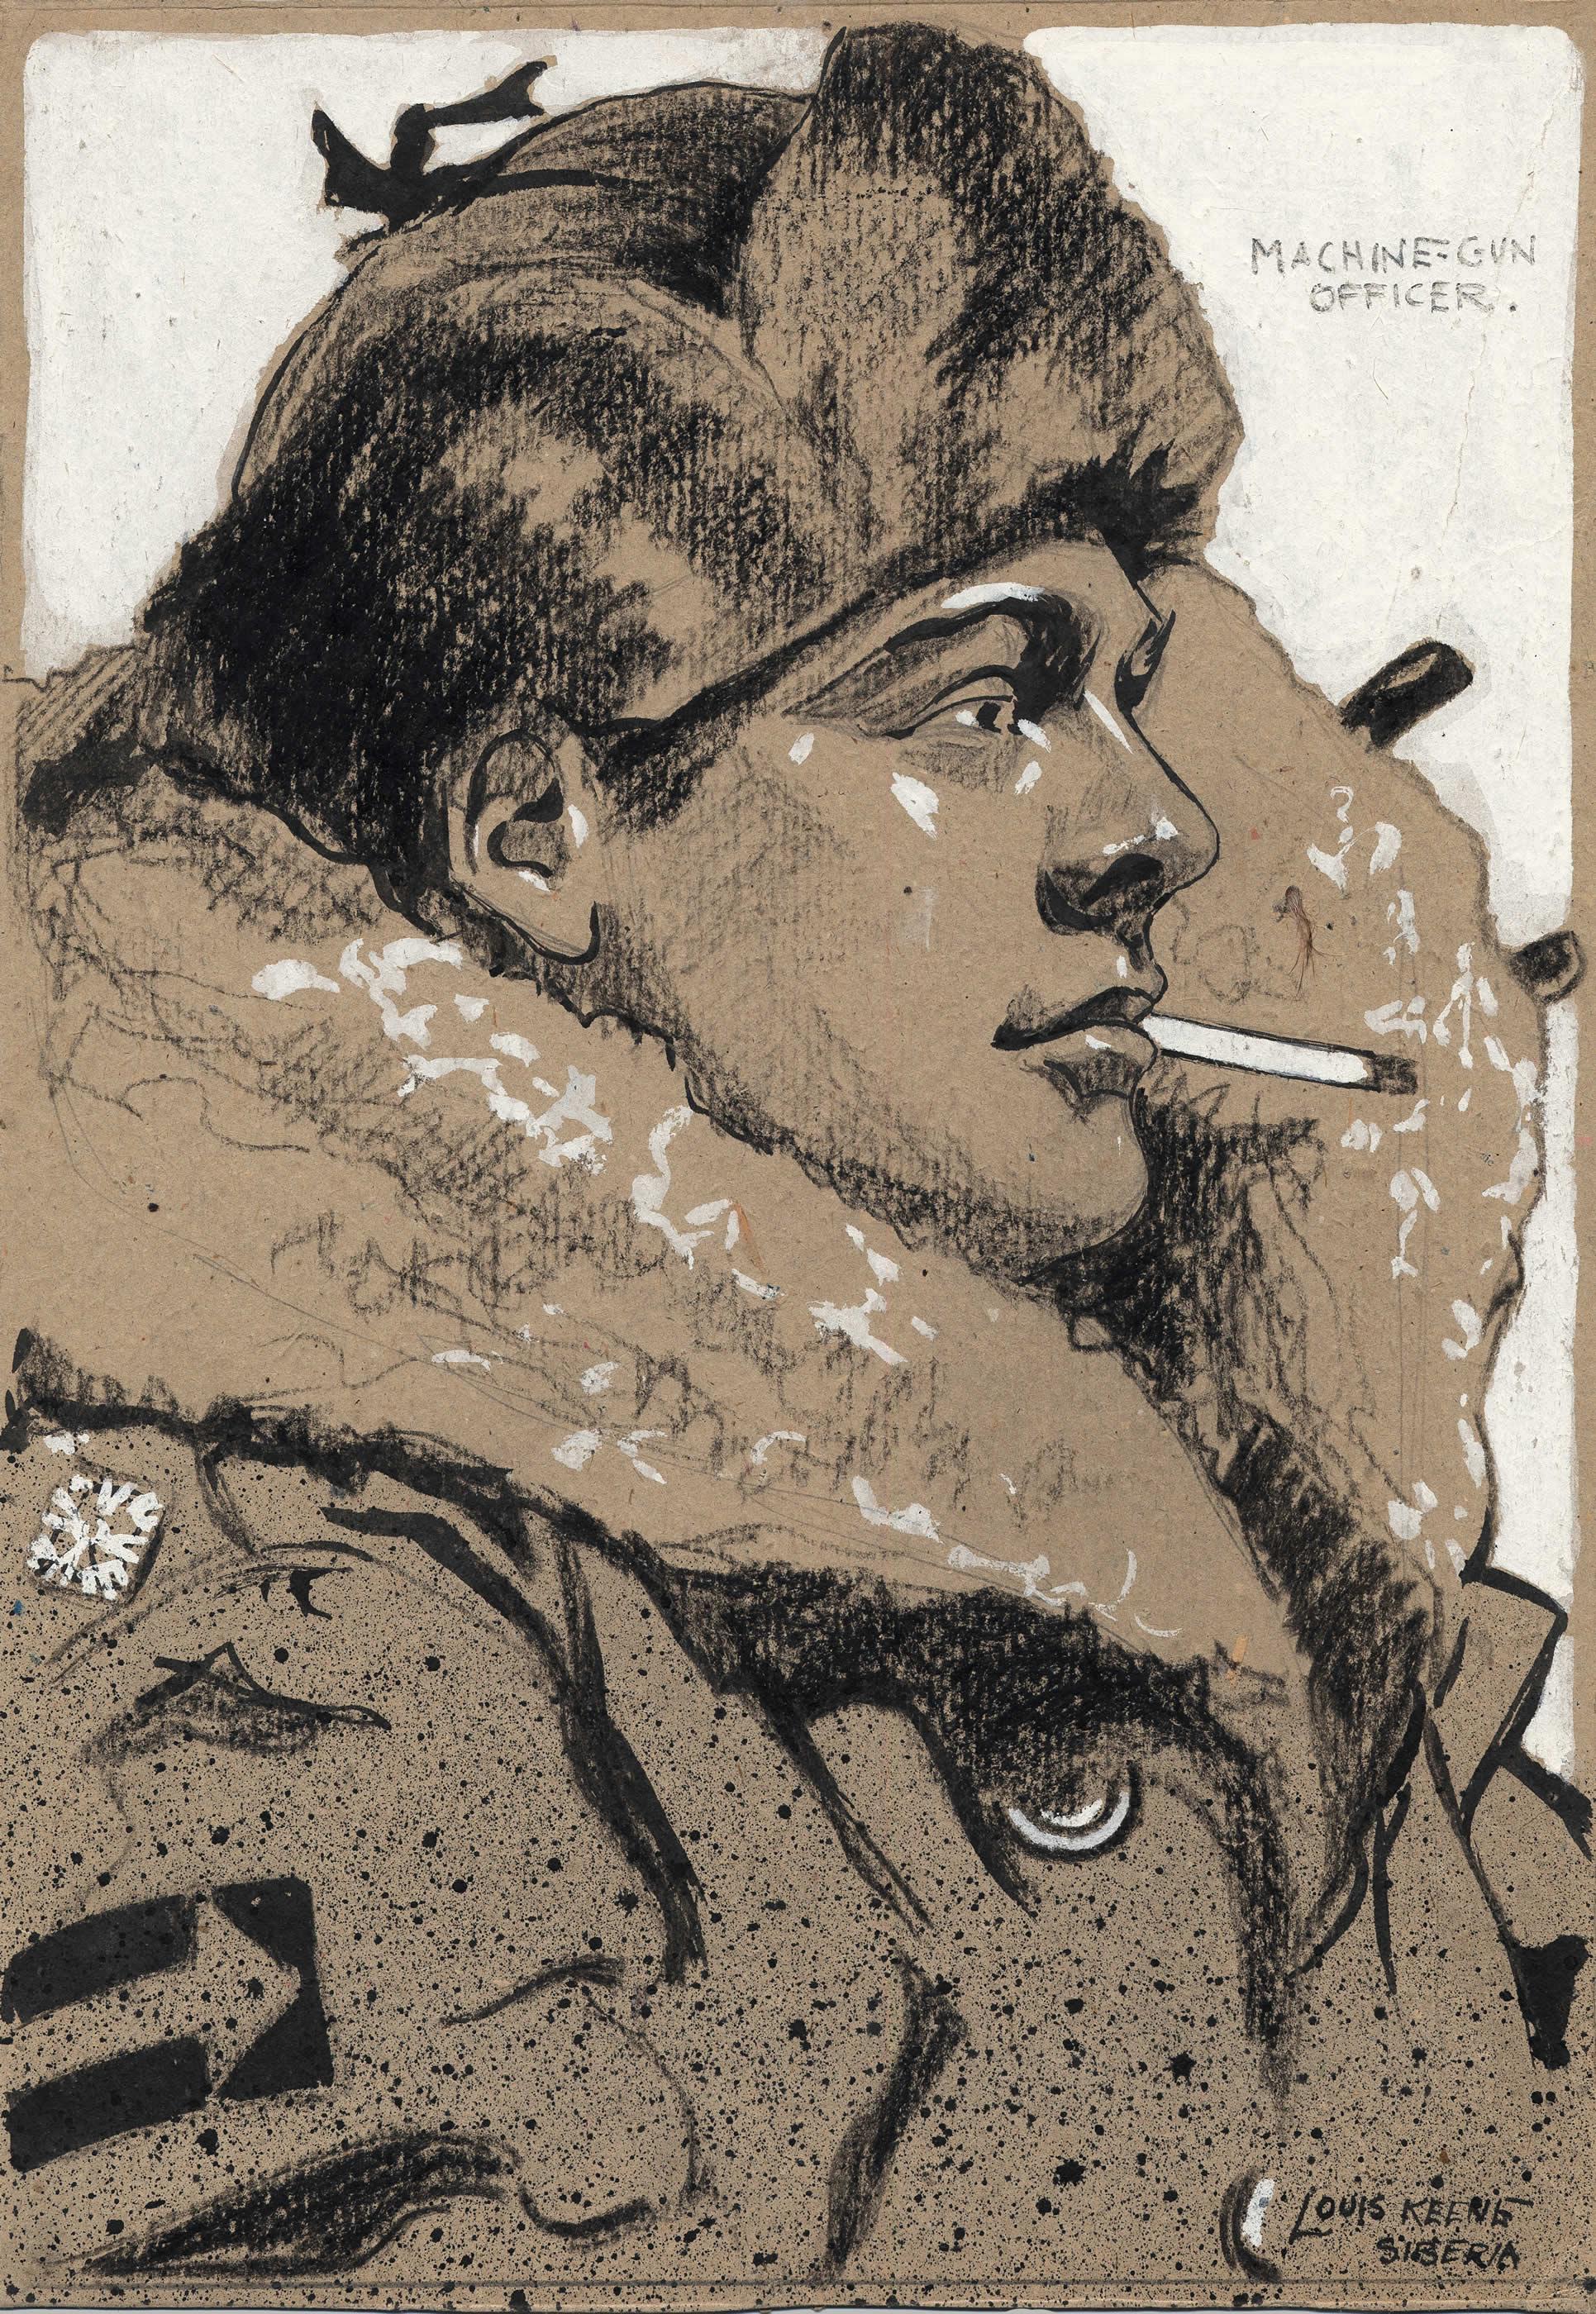 <i>Un officier mitrailleur, Sibérie</i>